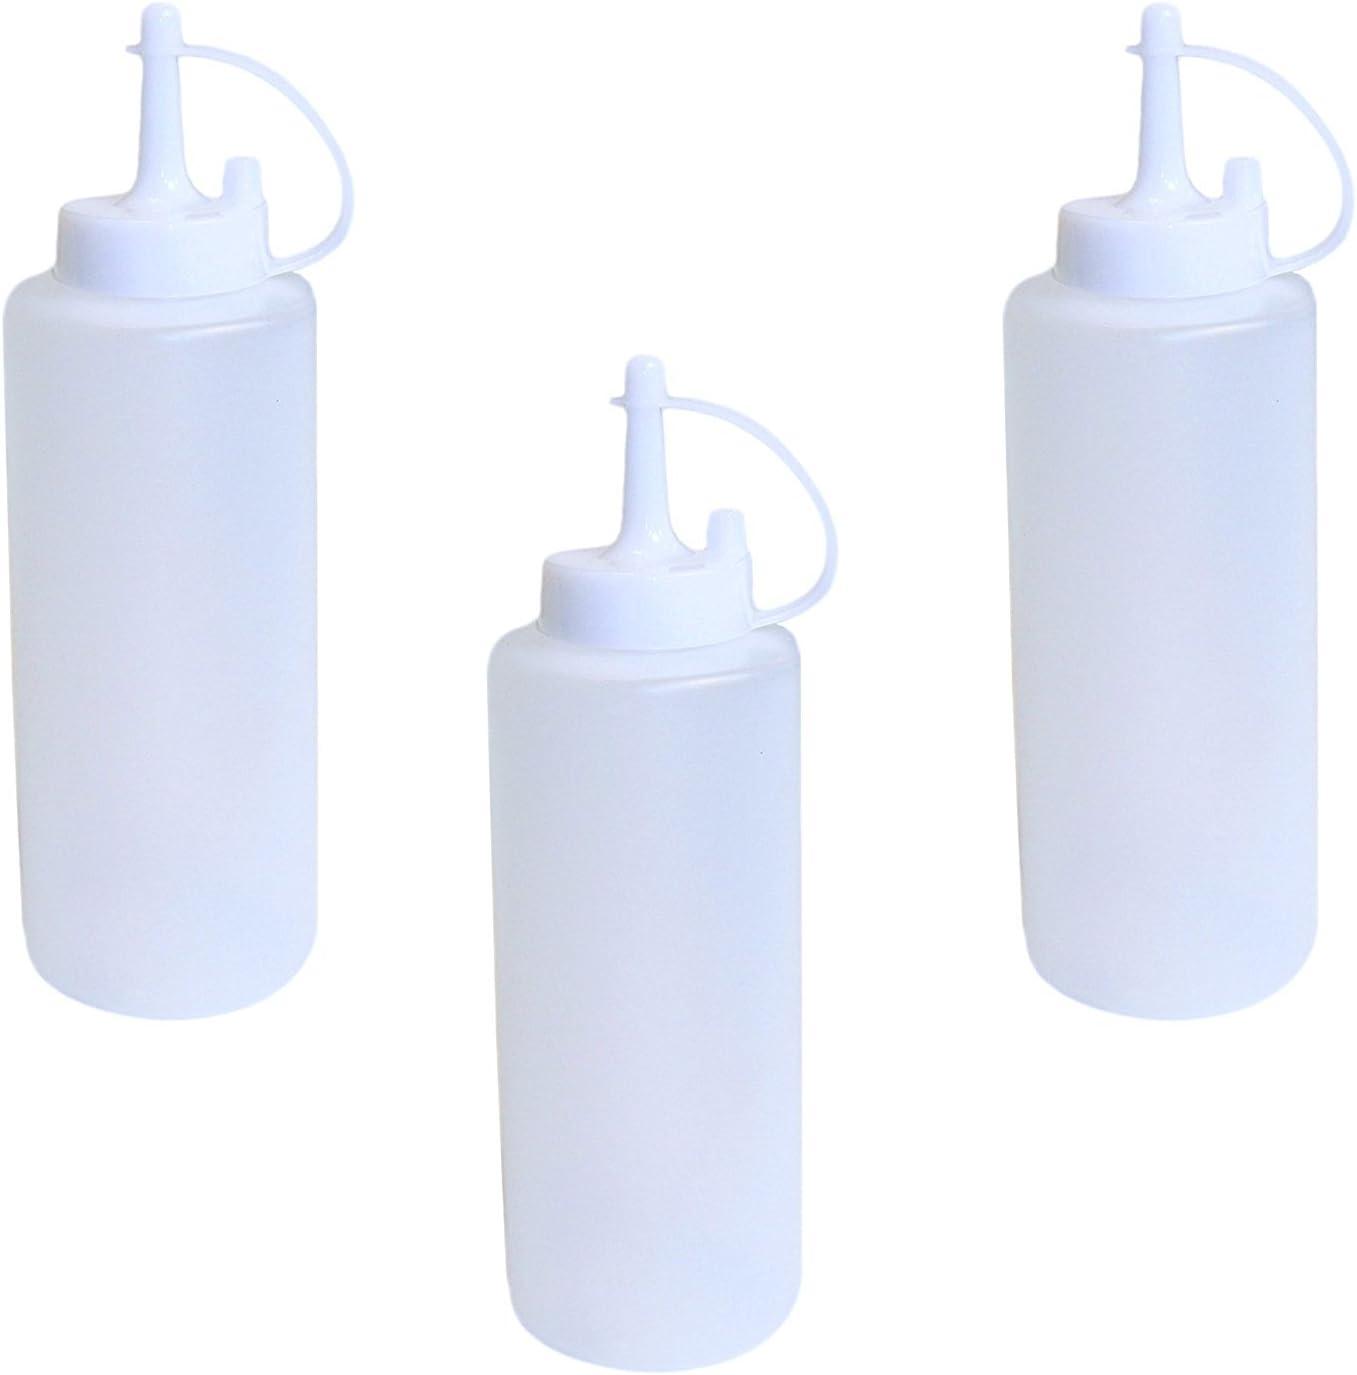 Chef Craft Set Sales of 3 Austin Mall Plastic BBQ Caps Disp Squeeze Ketchup Sauce